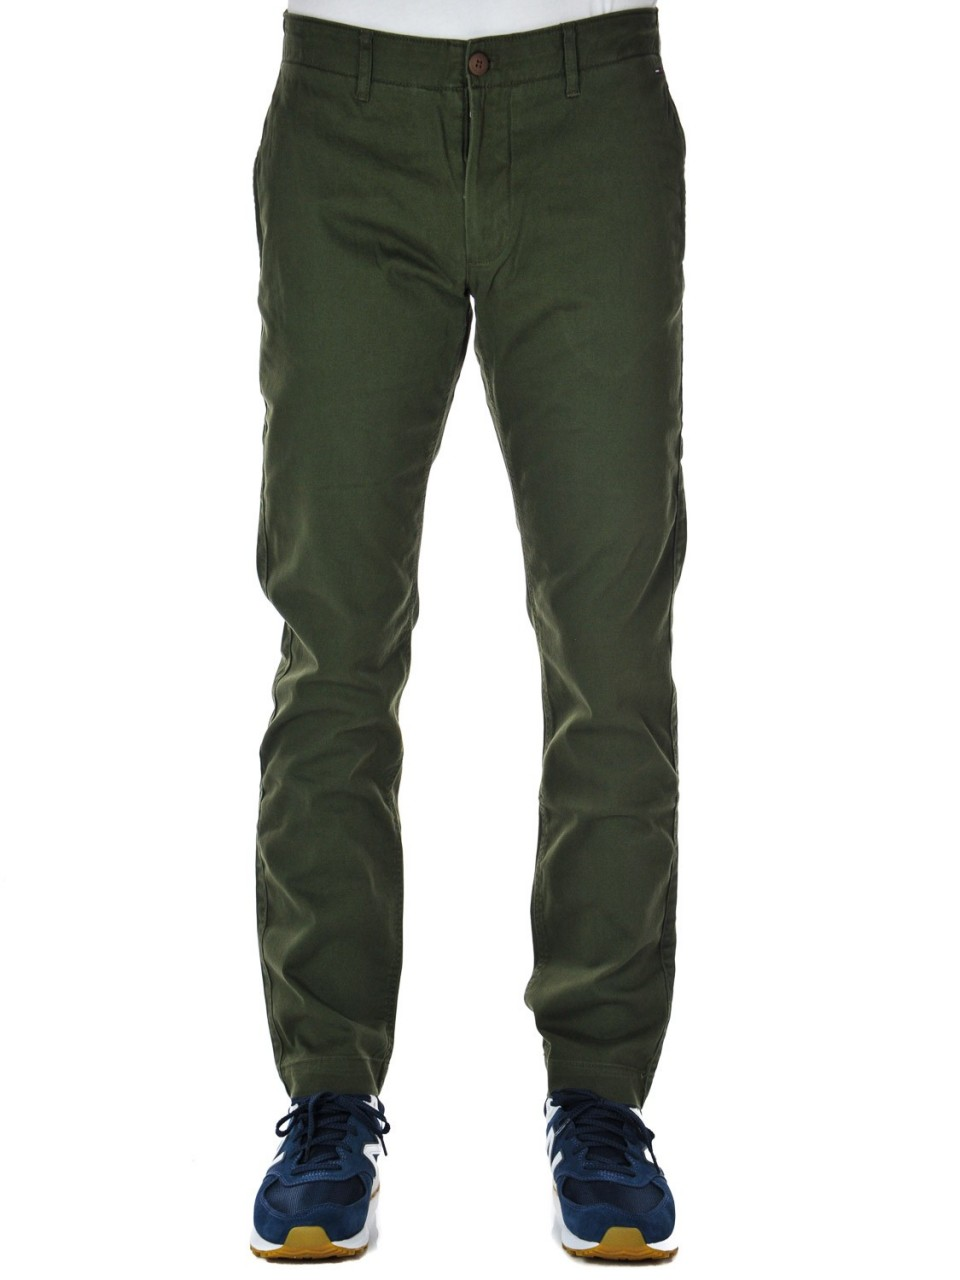 Tommy hilfiger Pantalone Tommy Hilfiger Jeans Uomo Chino Slim Essent 05046I